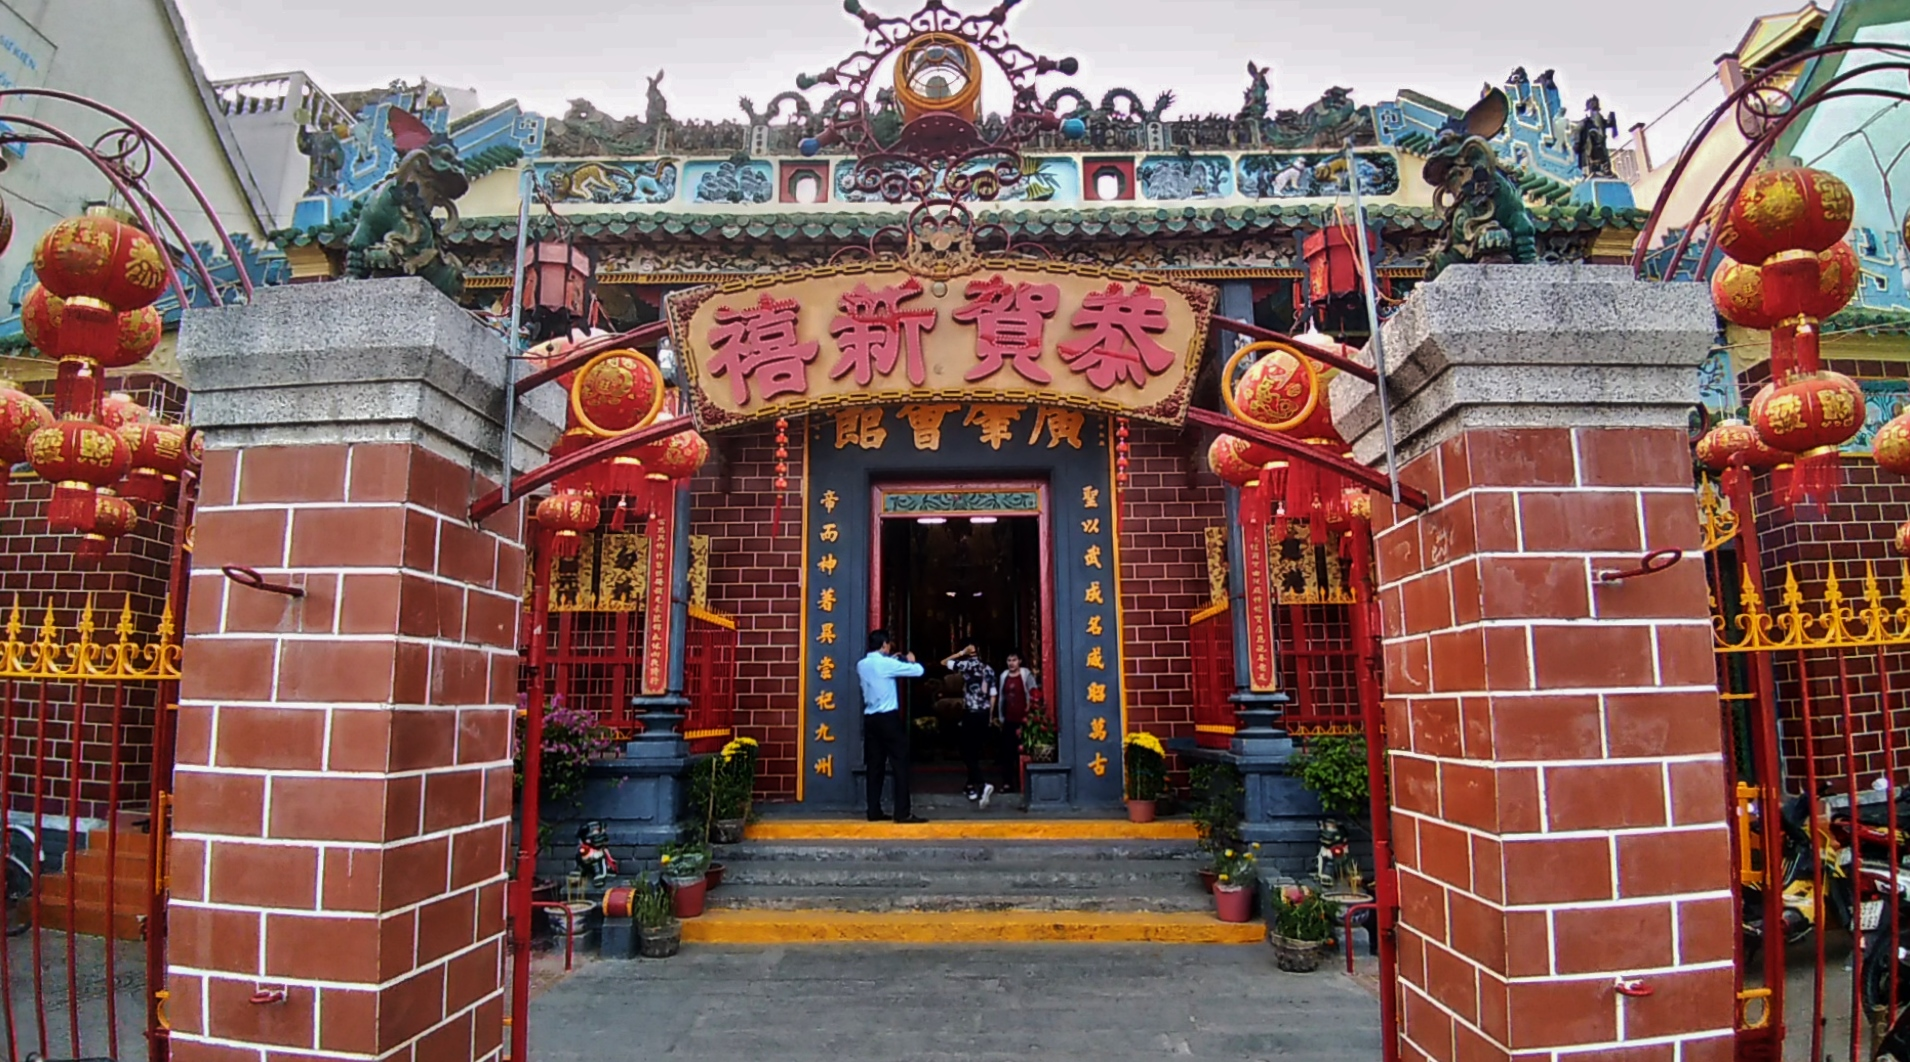 Admirer la pagode d'Ong